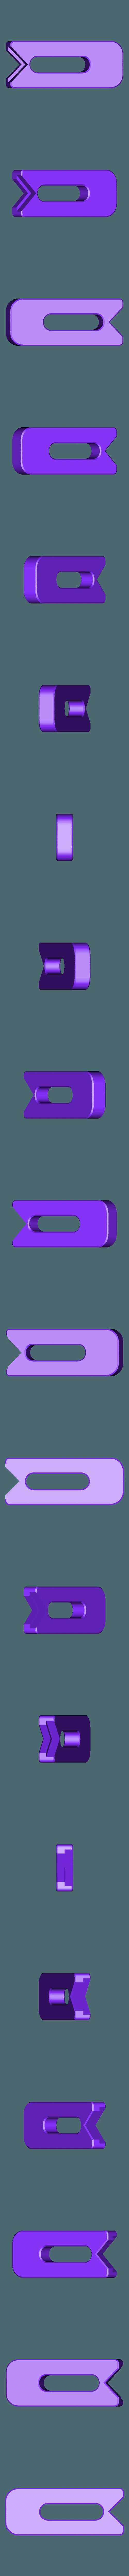 clampstepcorner.stl Download free STL file CNC 3018 Clamp set • 3D printing object, Sagittario